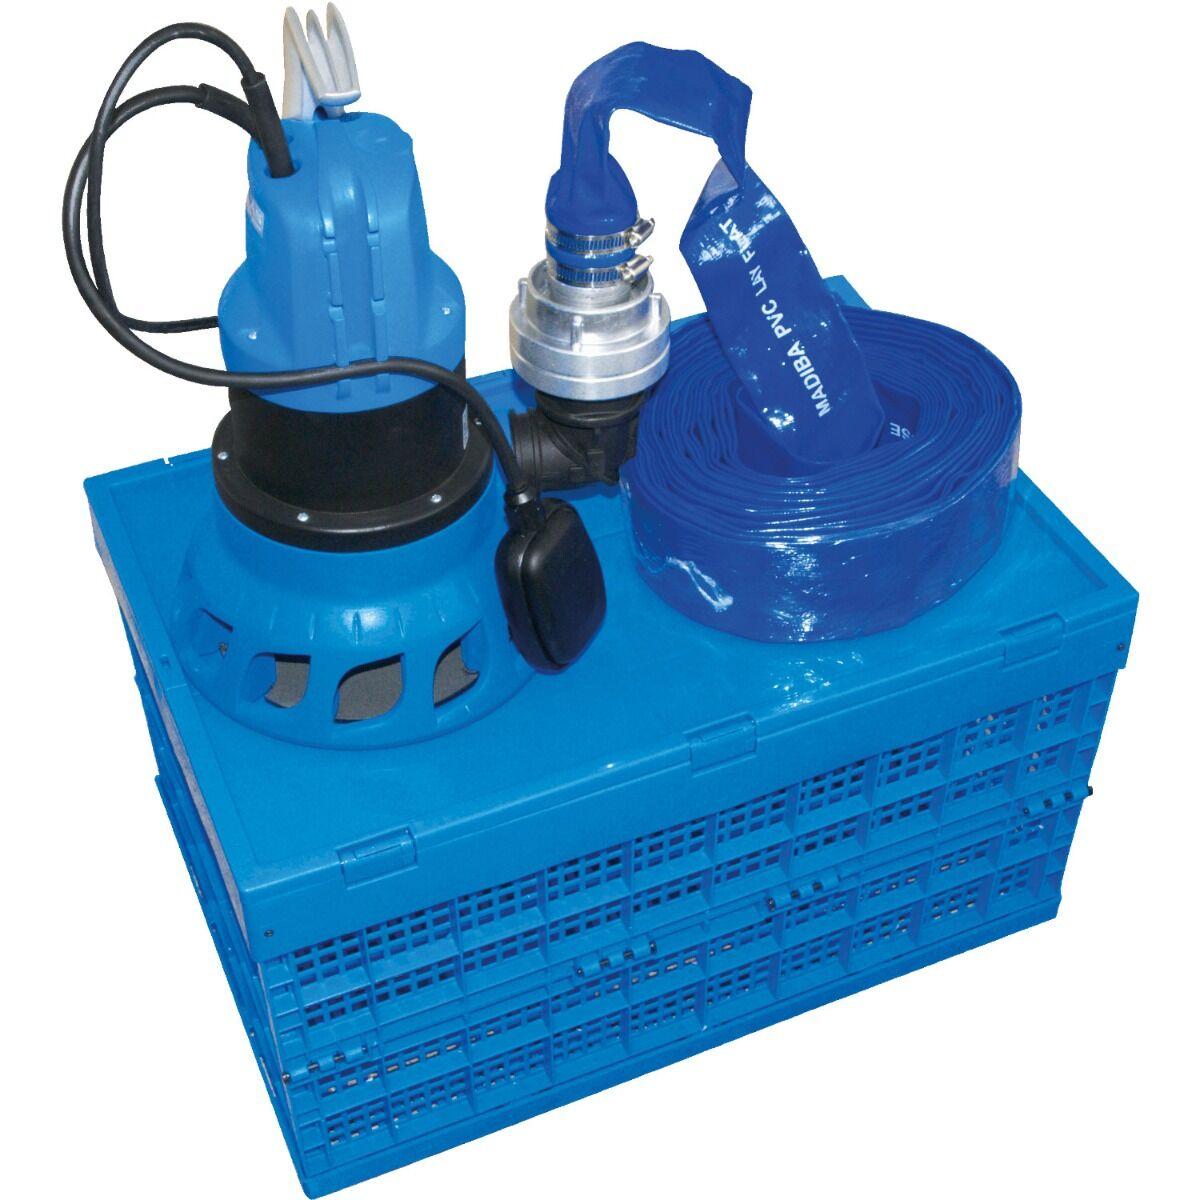 TALLAS D-DWP 1000 Flooding Kit